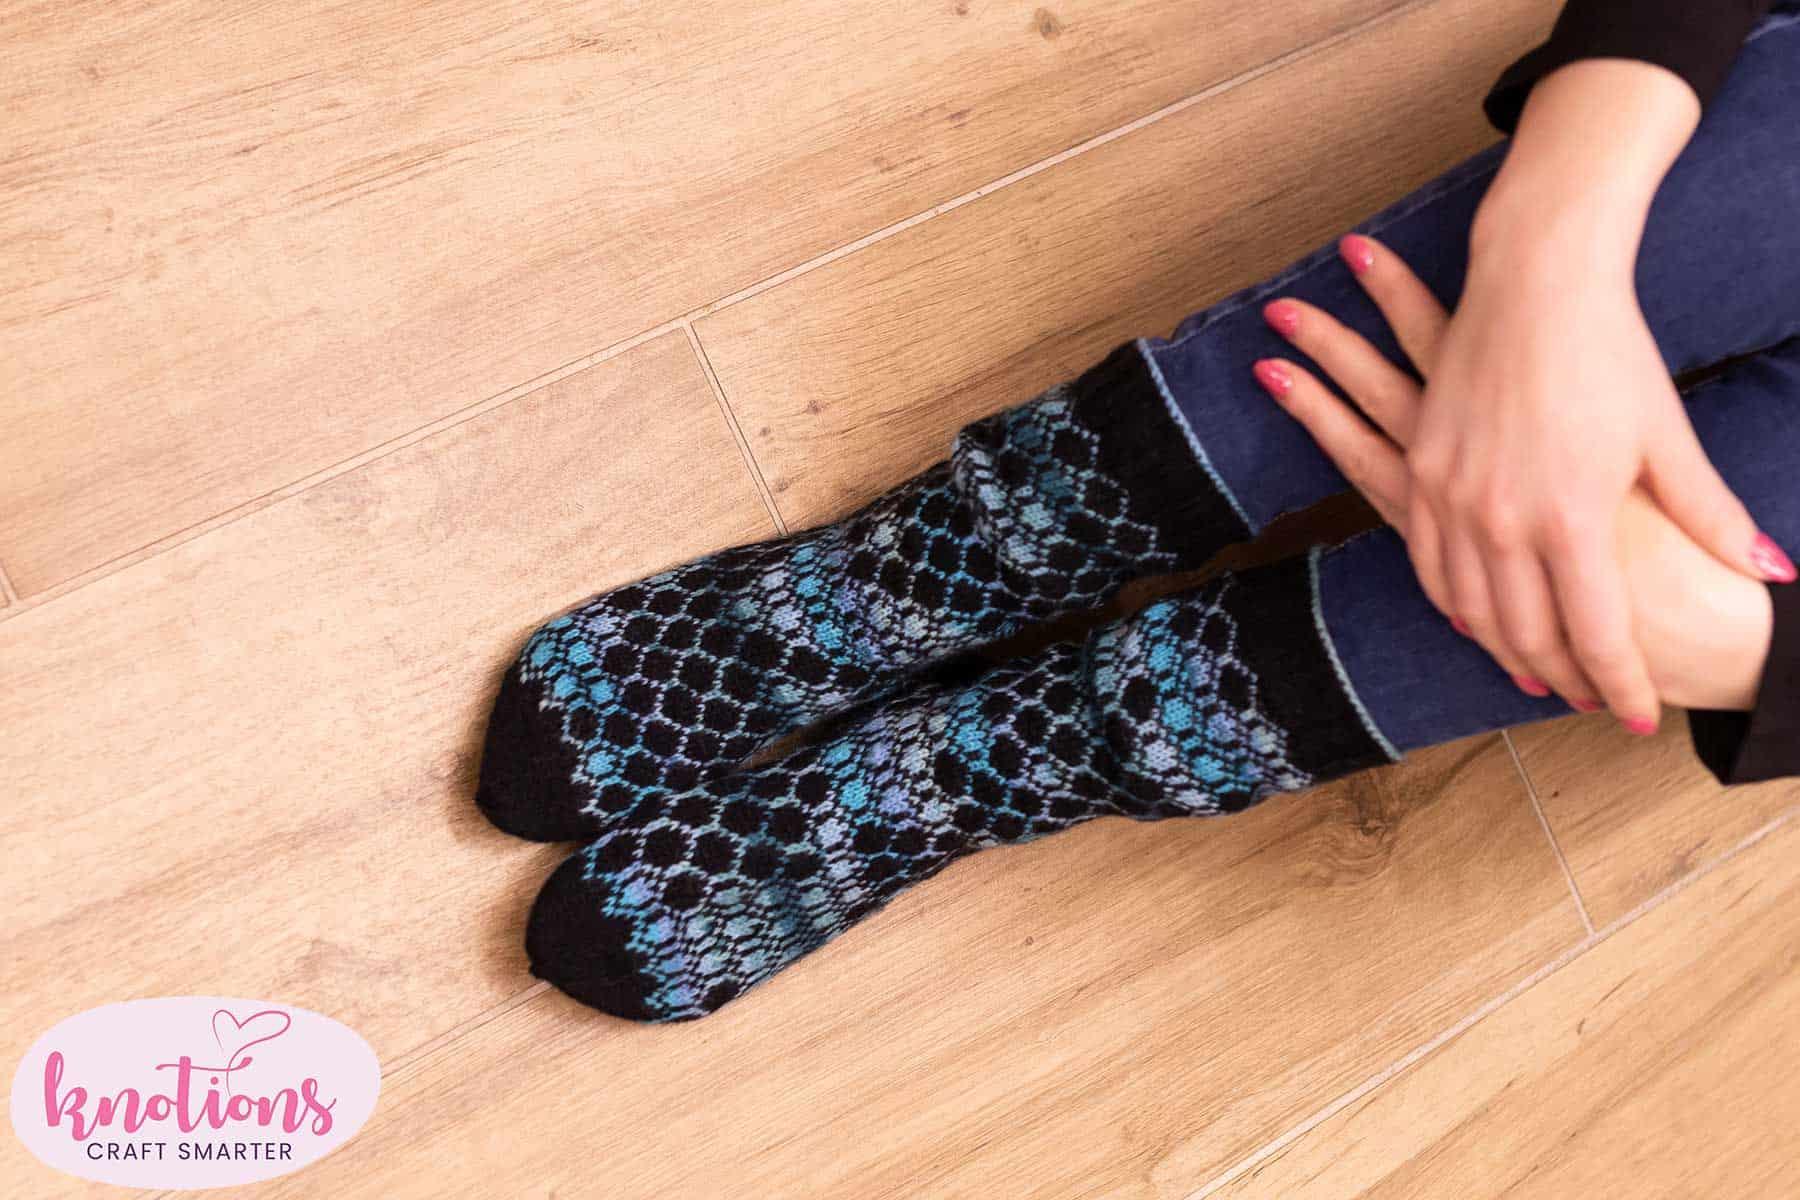 hexbin-socks-3